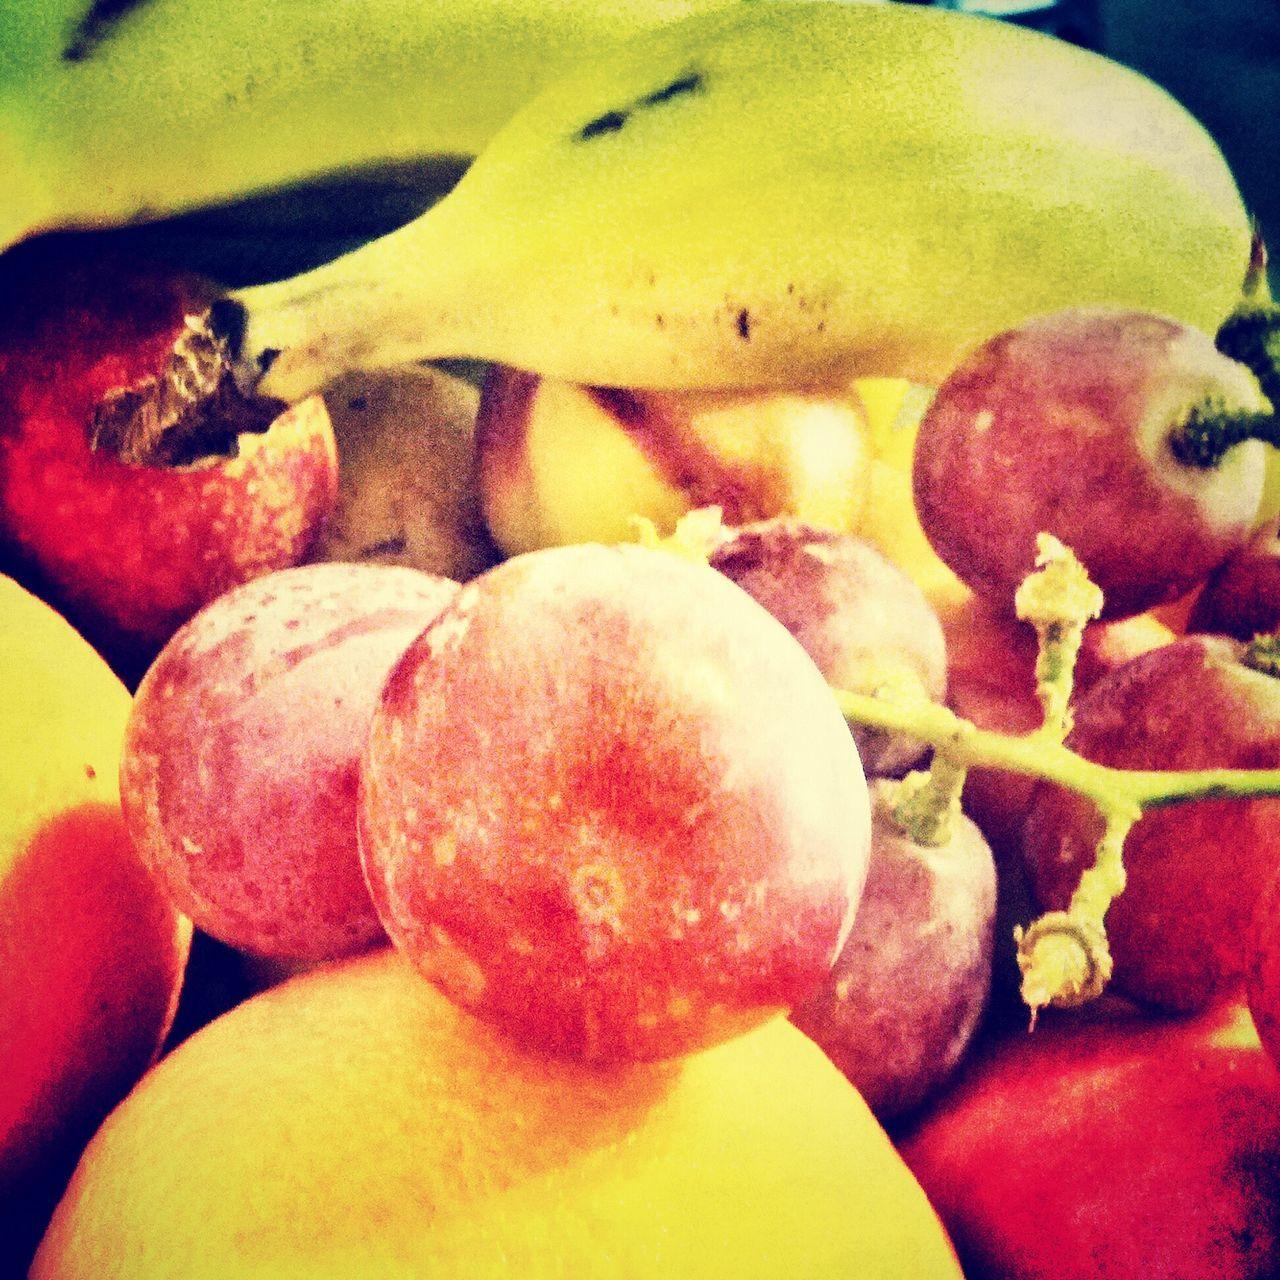 Fruit at work Fruit Grapes Banana Foodporn